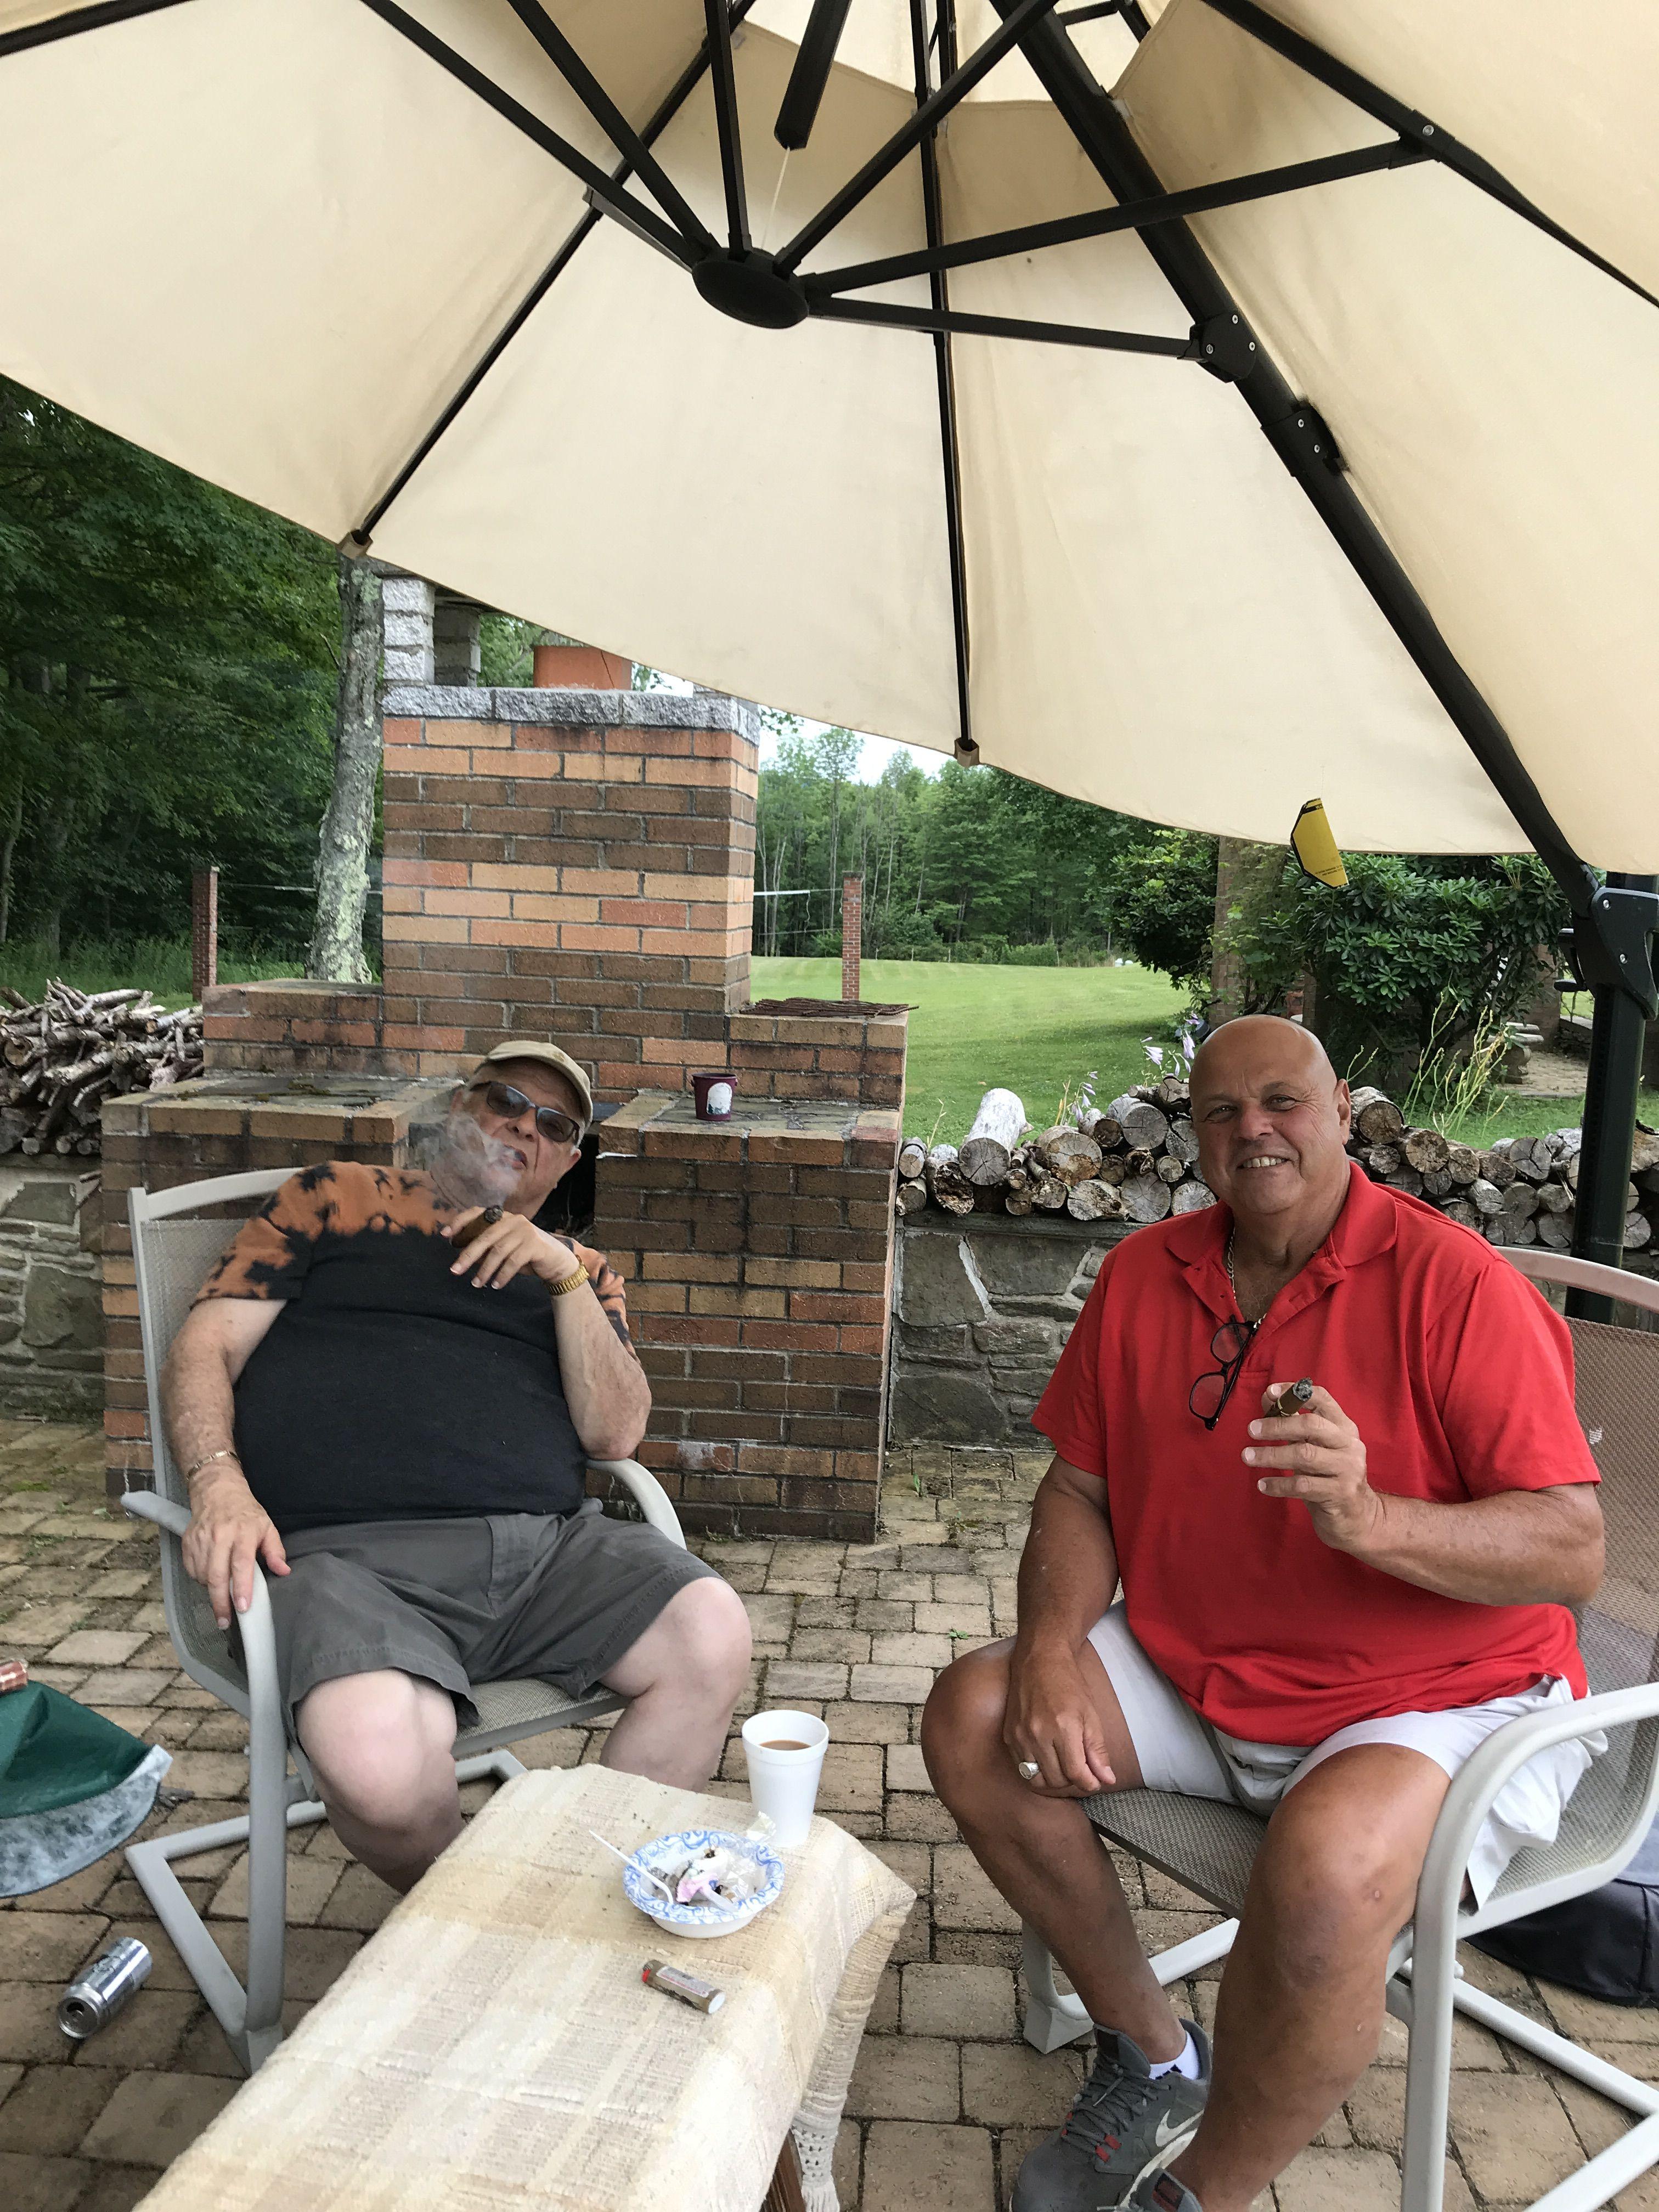 A Light Rain Made These Cigars Even More Enjoyable